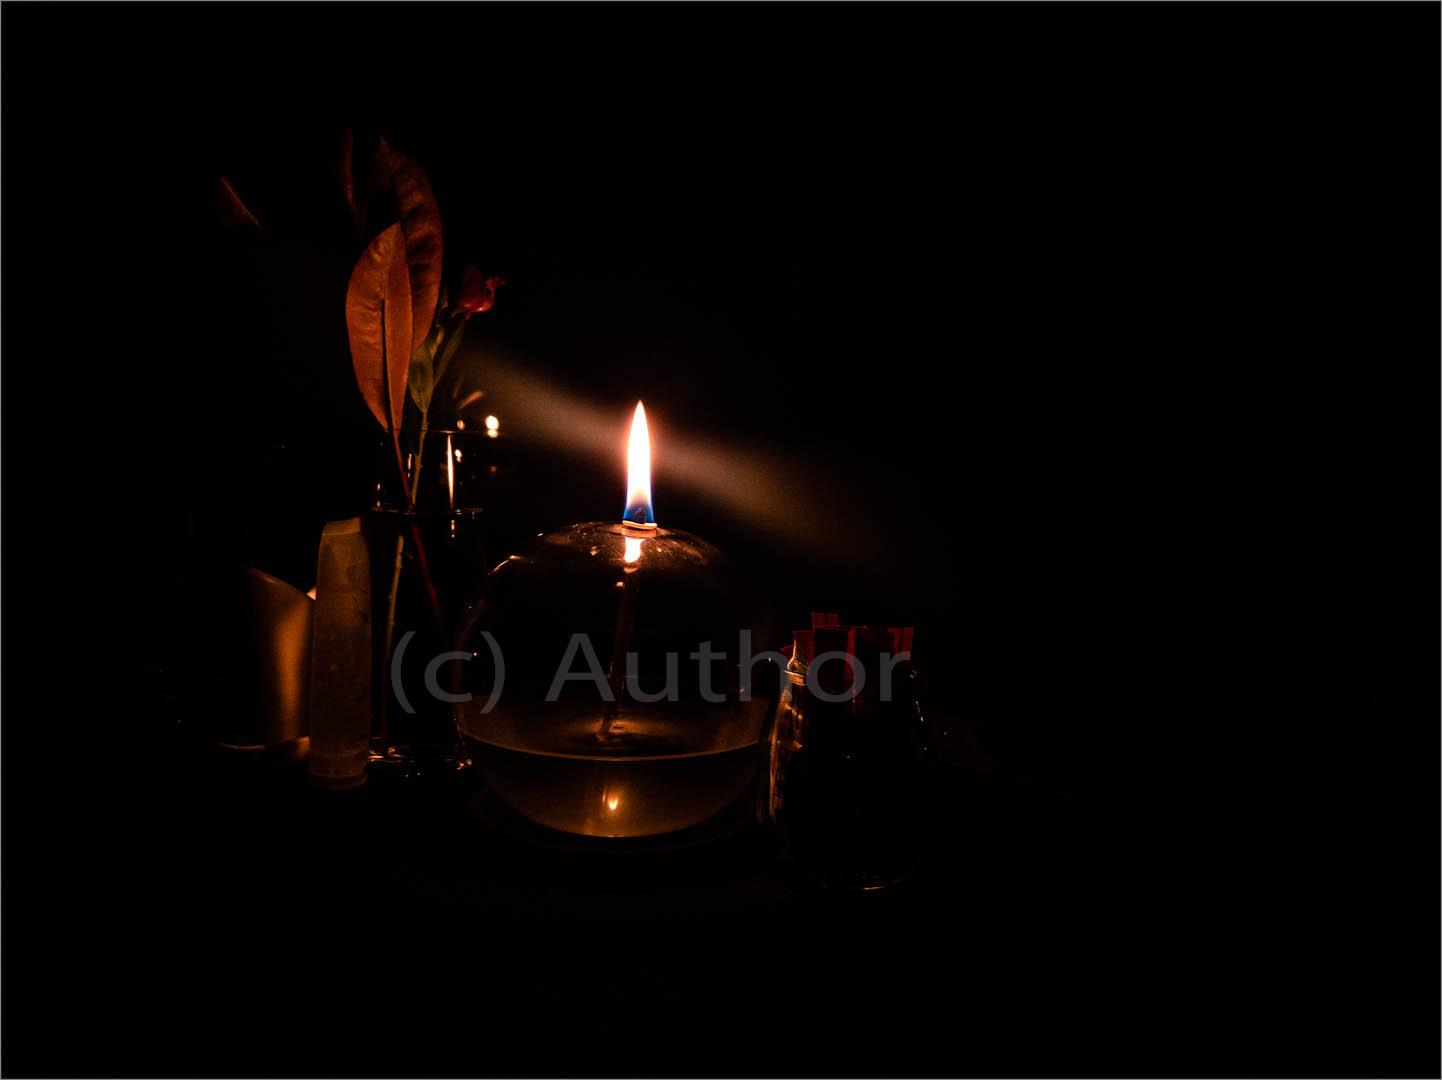 1_PI_This Little Light_Tahlita Verster